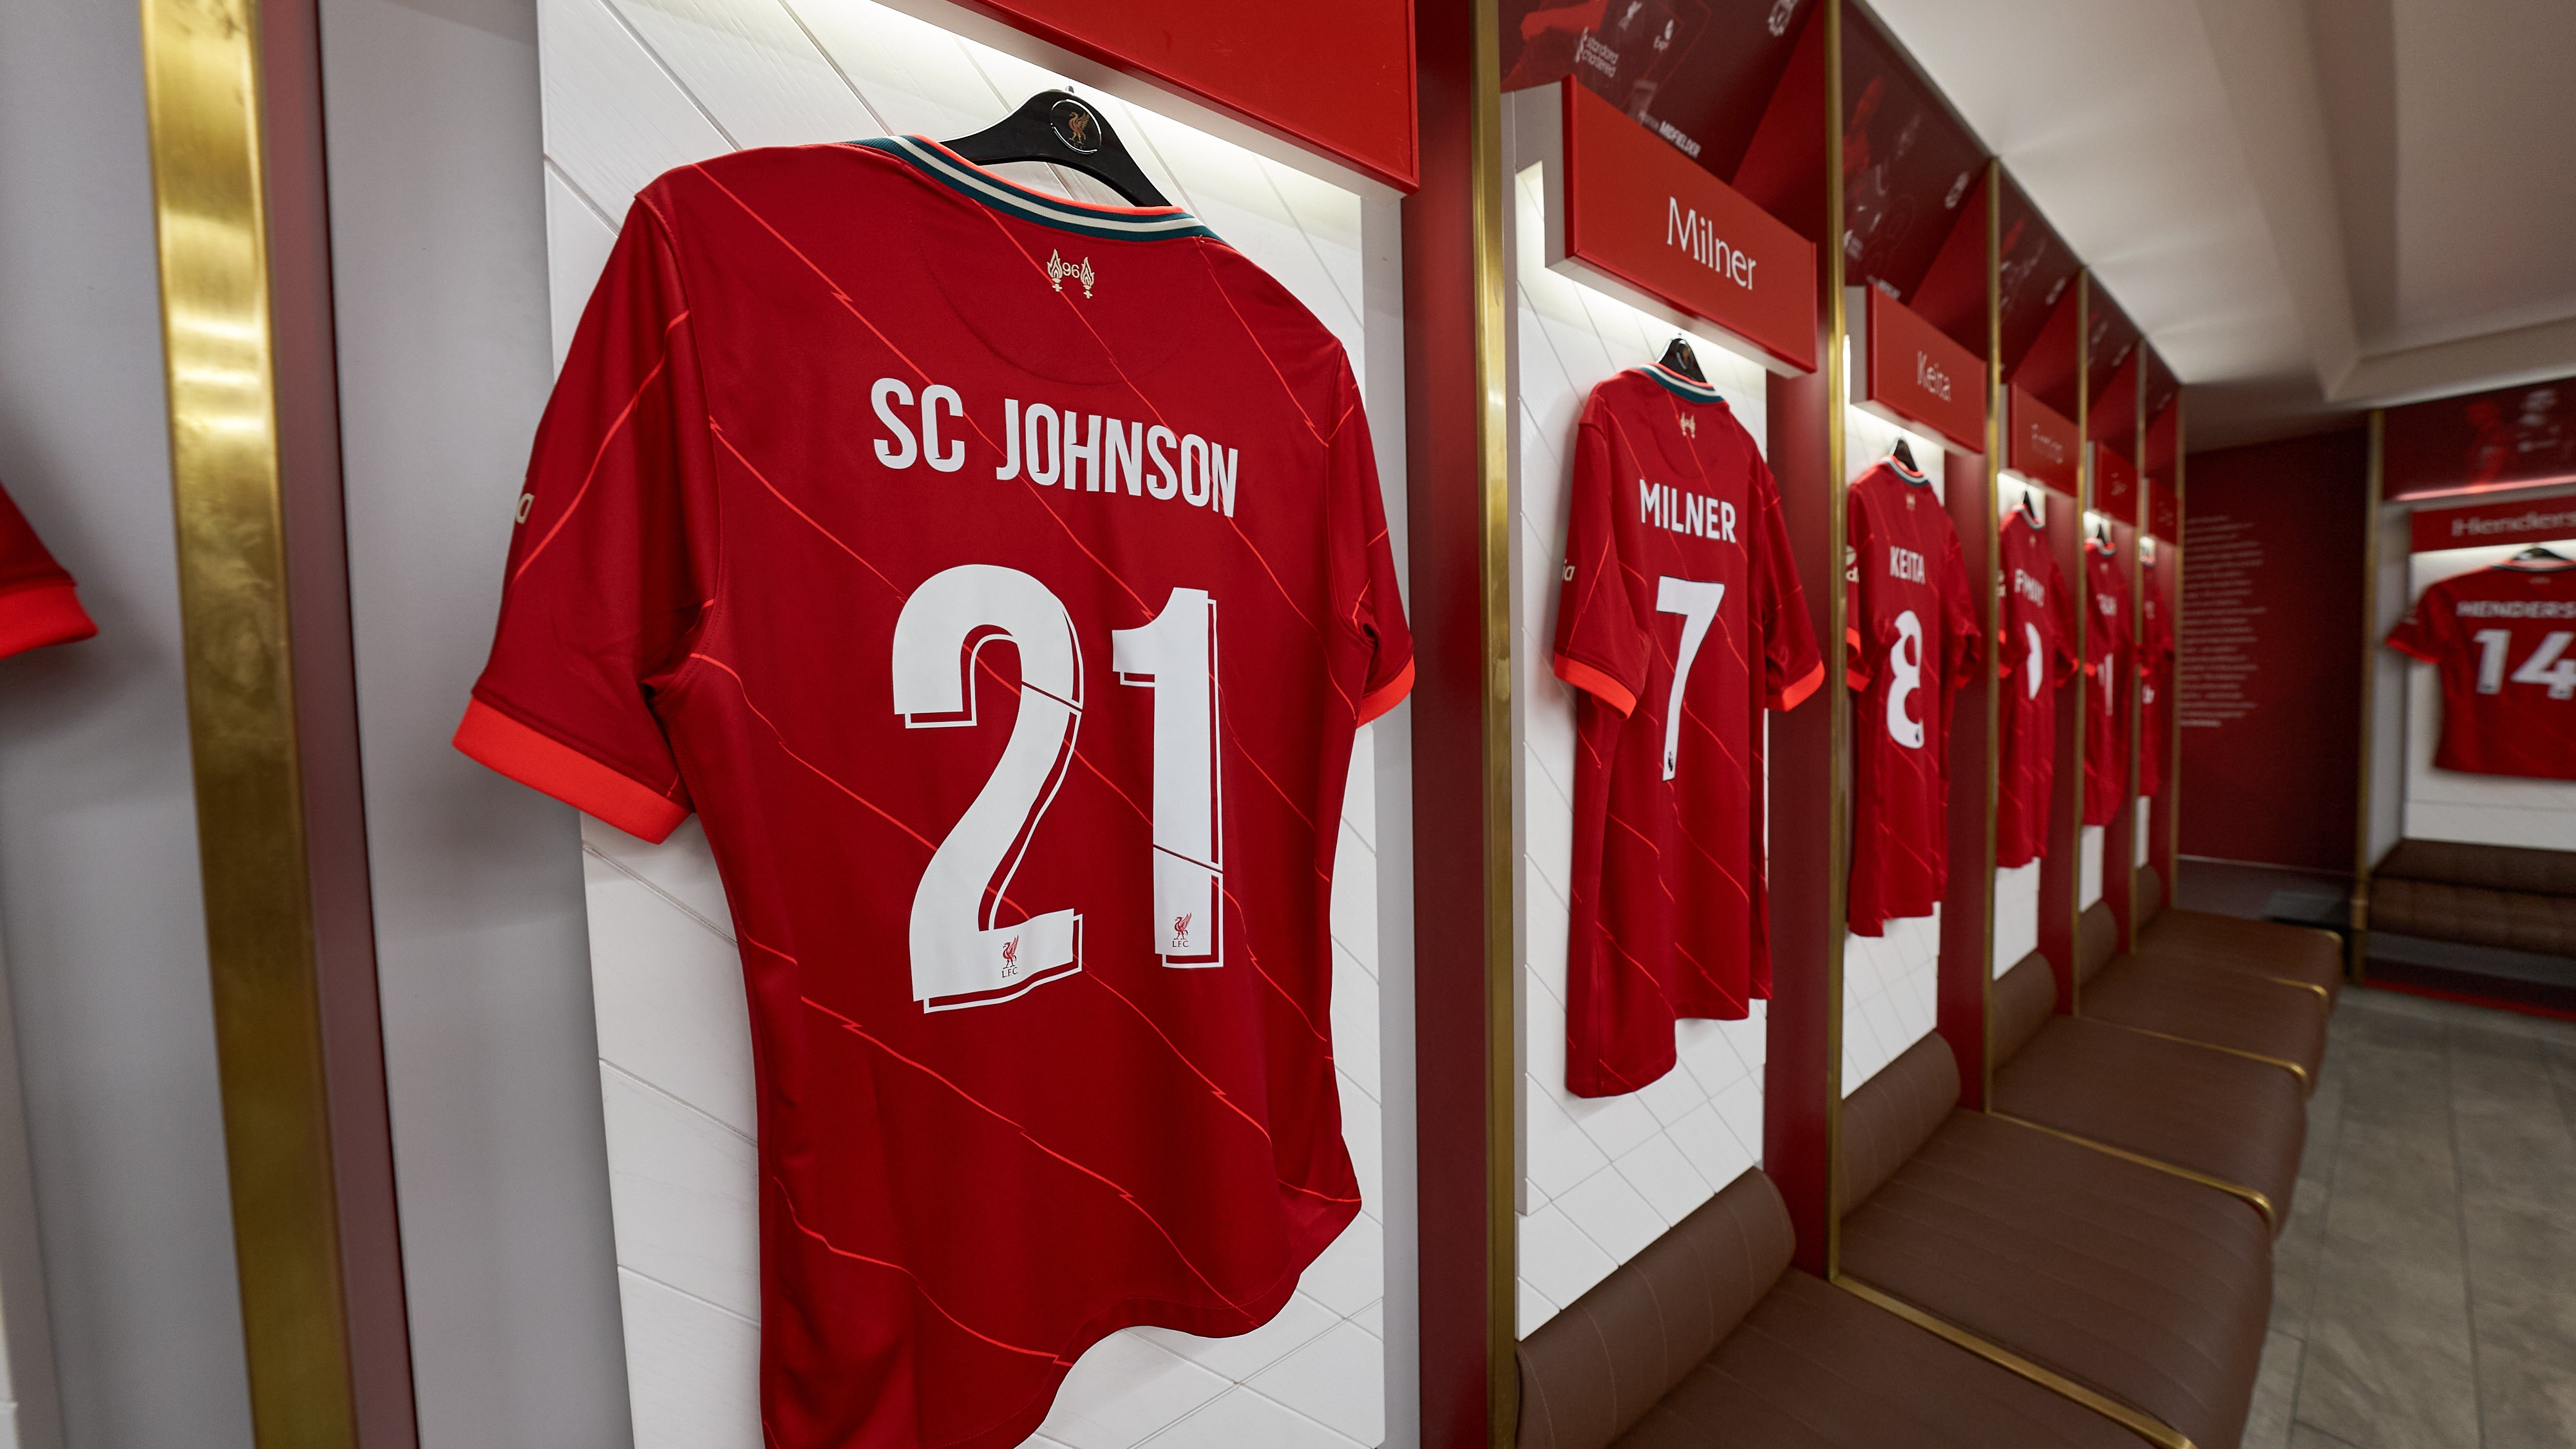 SC Johnson Liverpool Jersey Hanging Up